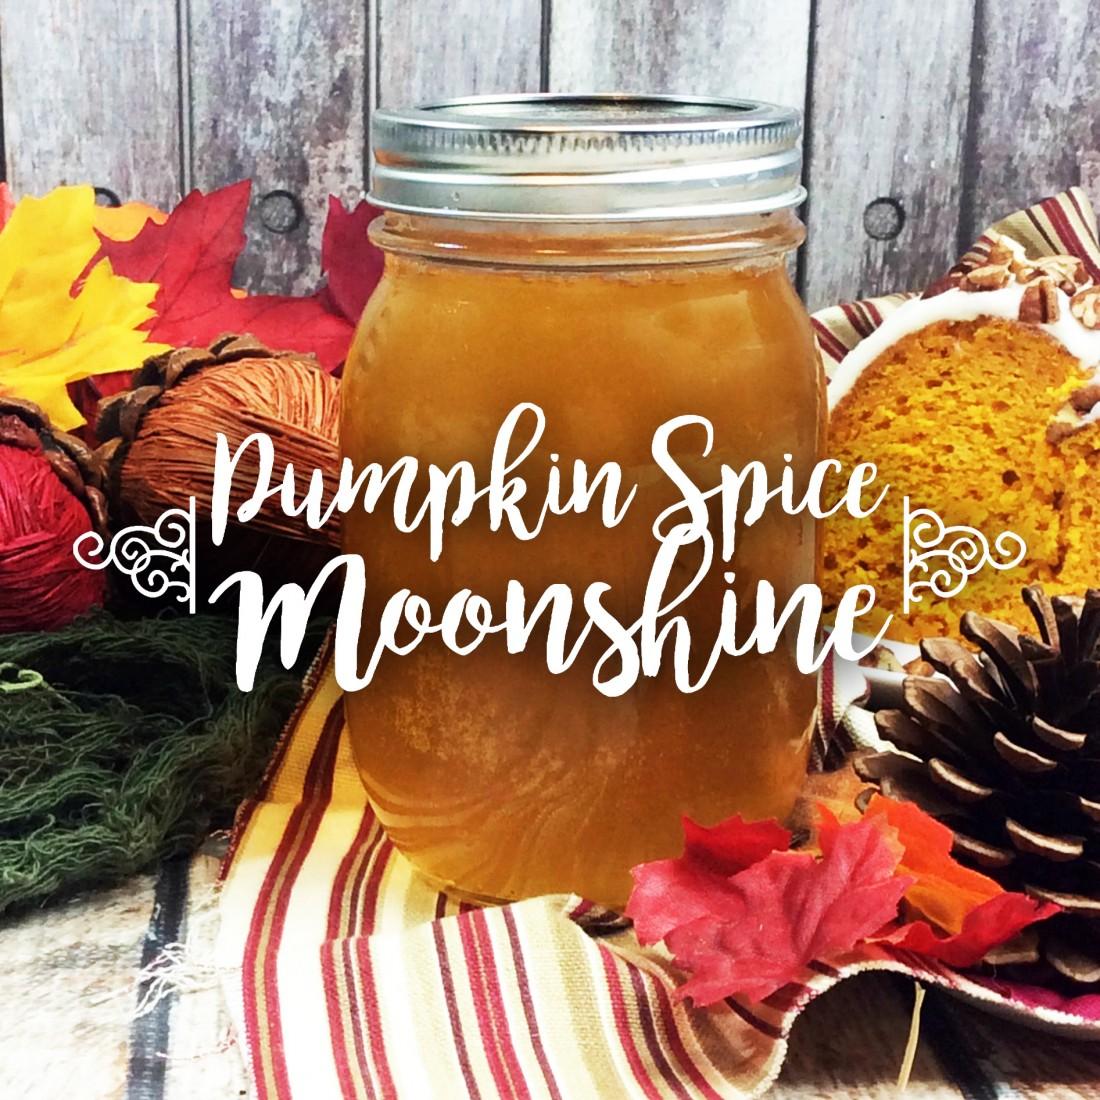 Pumpkin Spice Moonshine